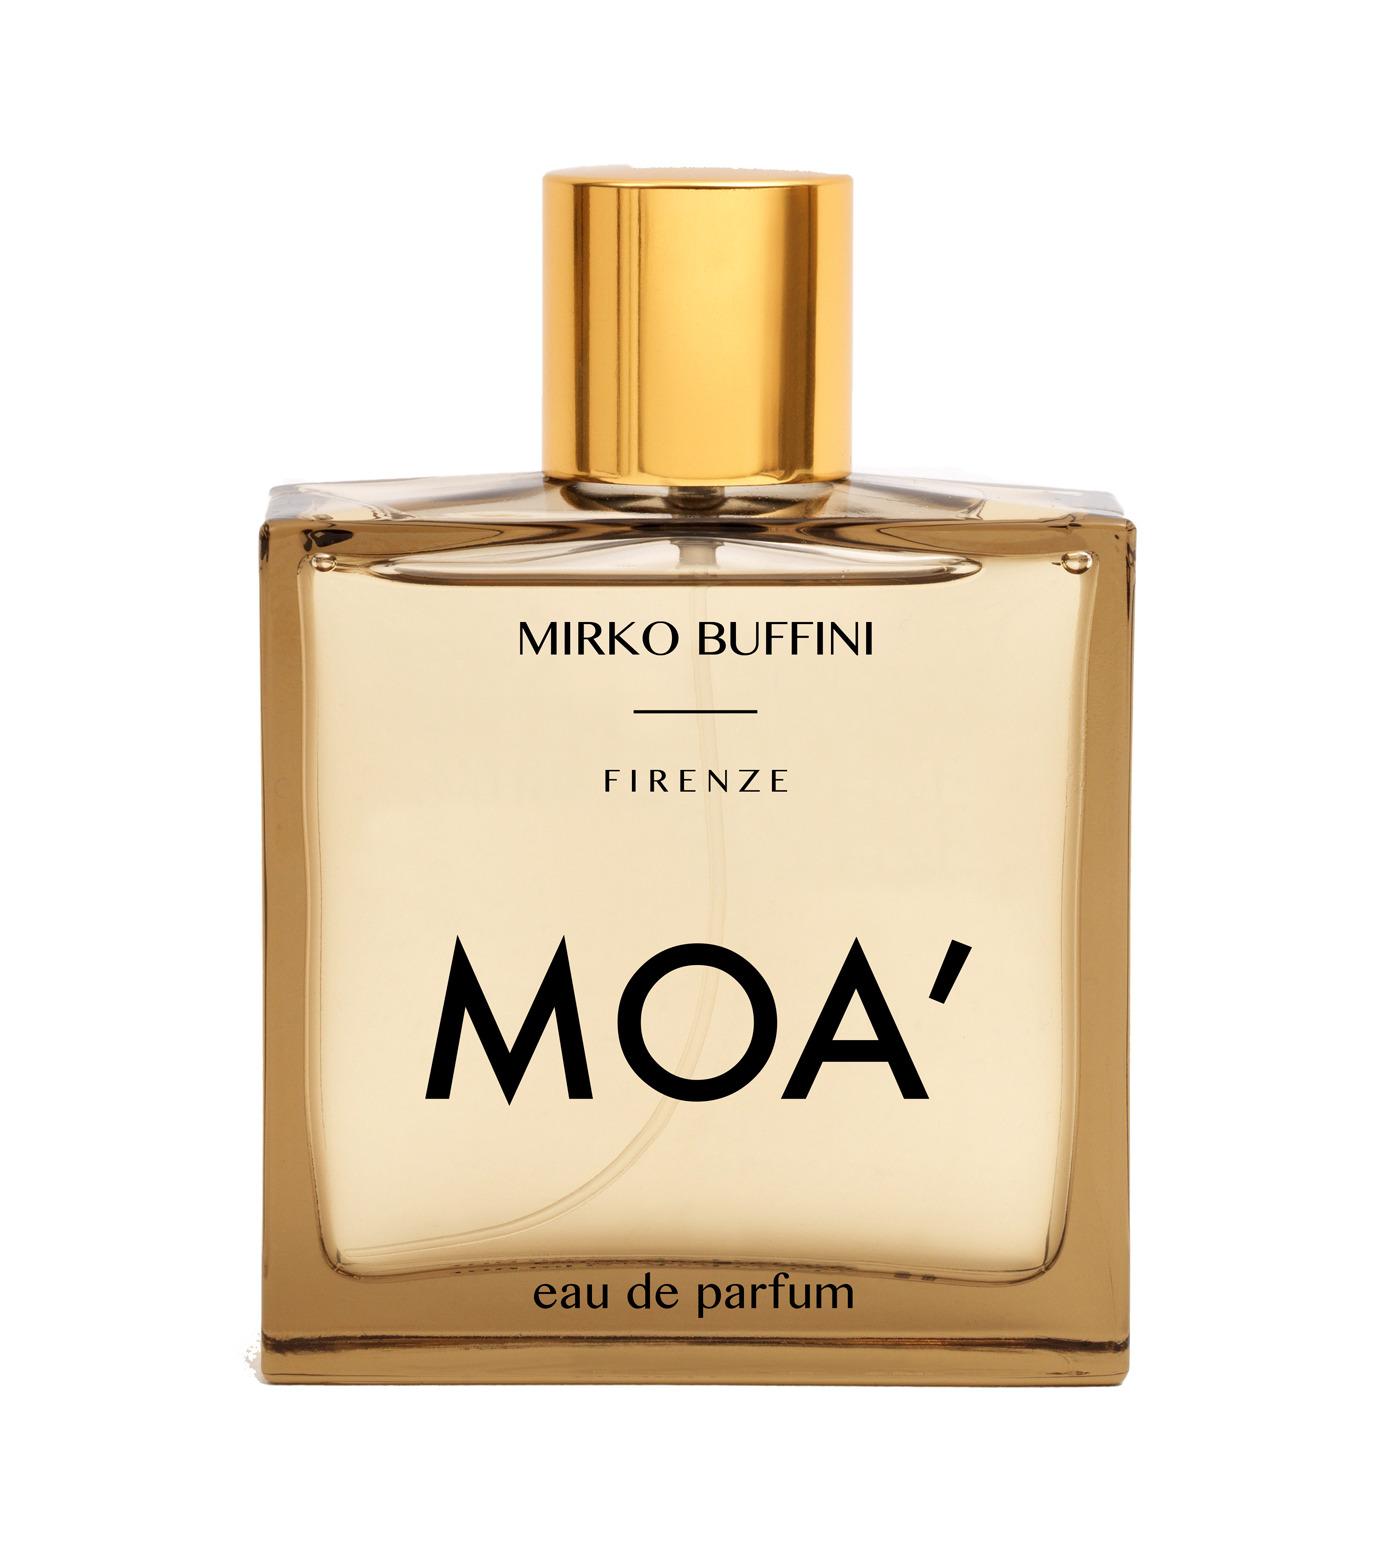 MIRKO BUFFINI(ミルコ・ブッフィーニ)のMOA' 30ml-GOLD(フレグランス/fragrance)-MB-10005-2 拡大詳細画像1